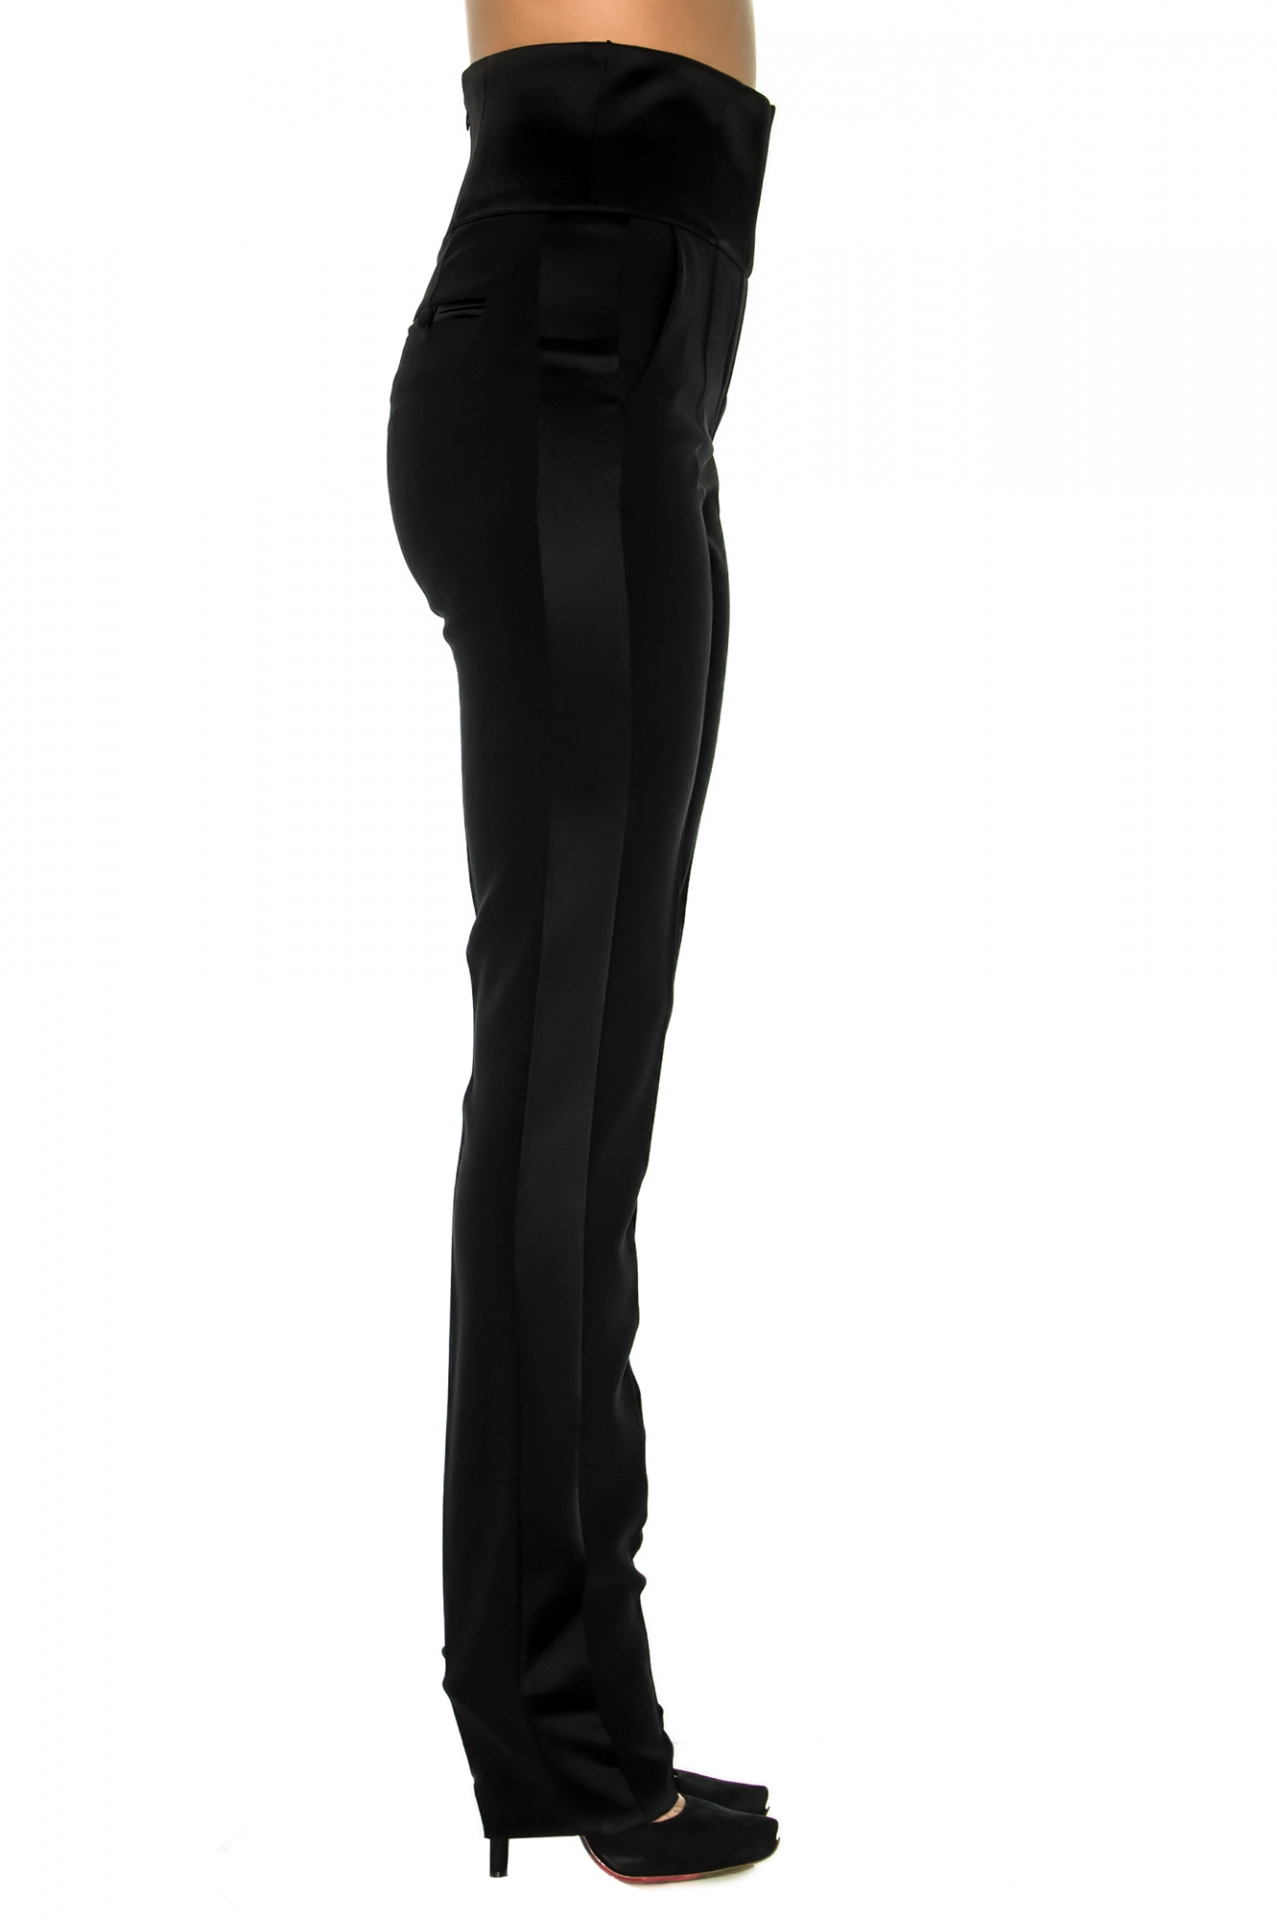 smoking pantalon taille haute stefanie stefanie renoma. Black Bedroom Furniture Sets. Home Design Ideas